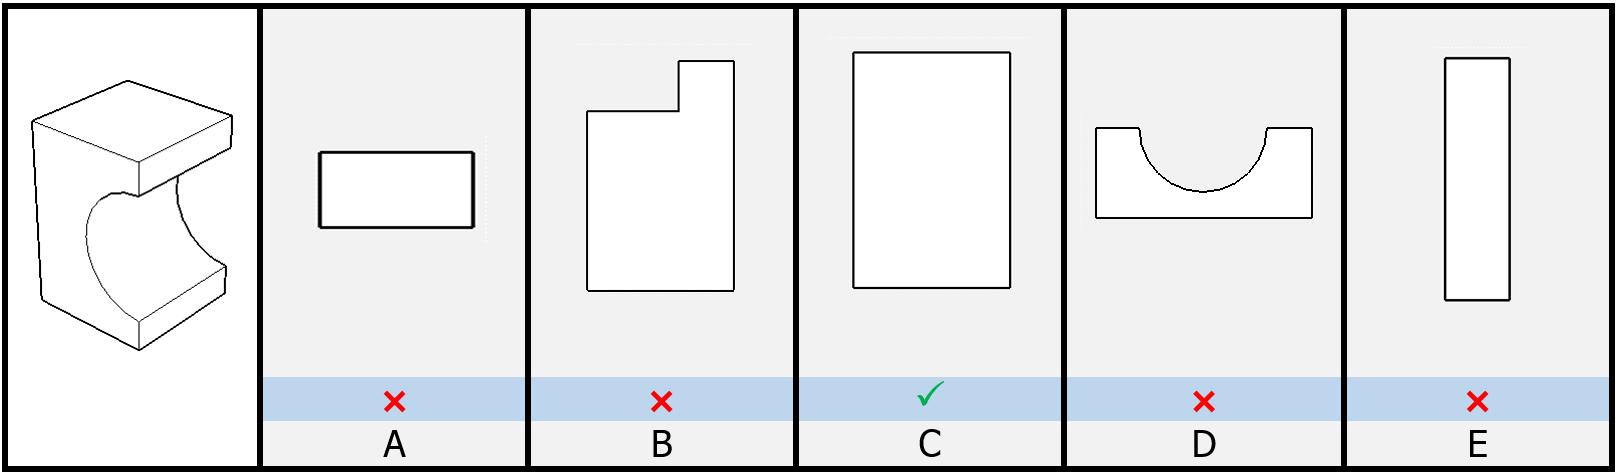 Keyhole_sample1